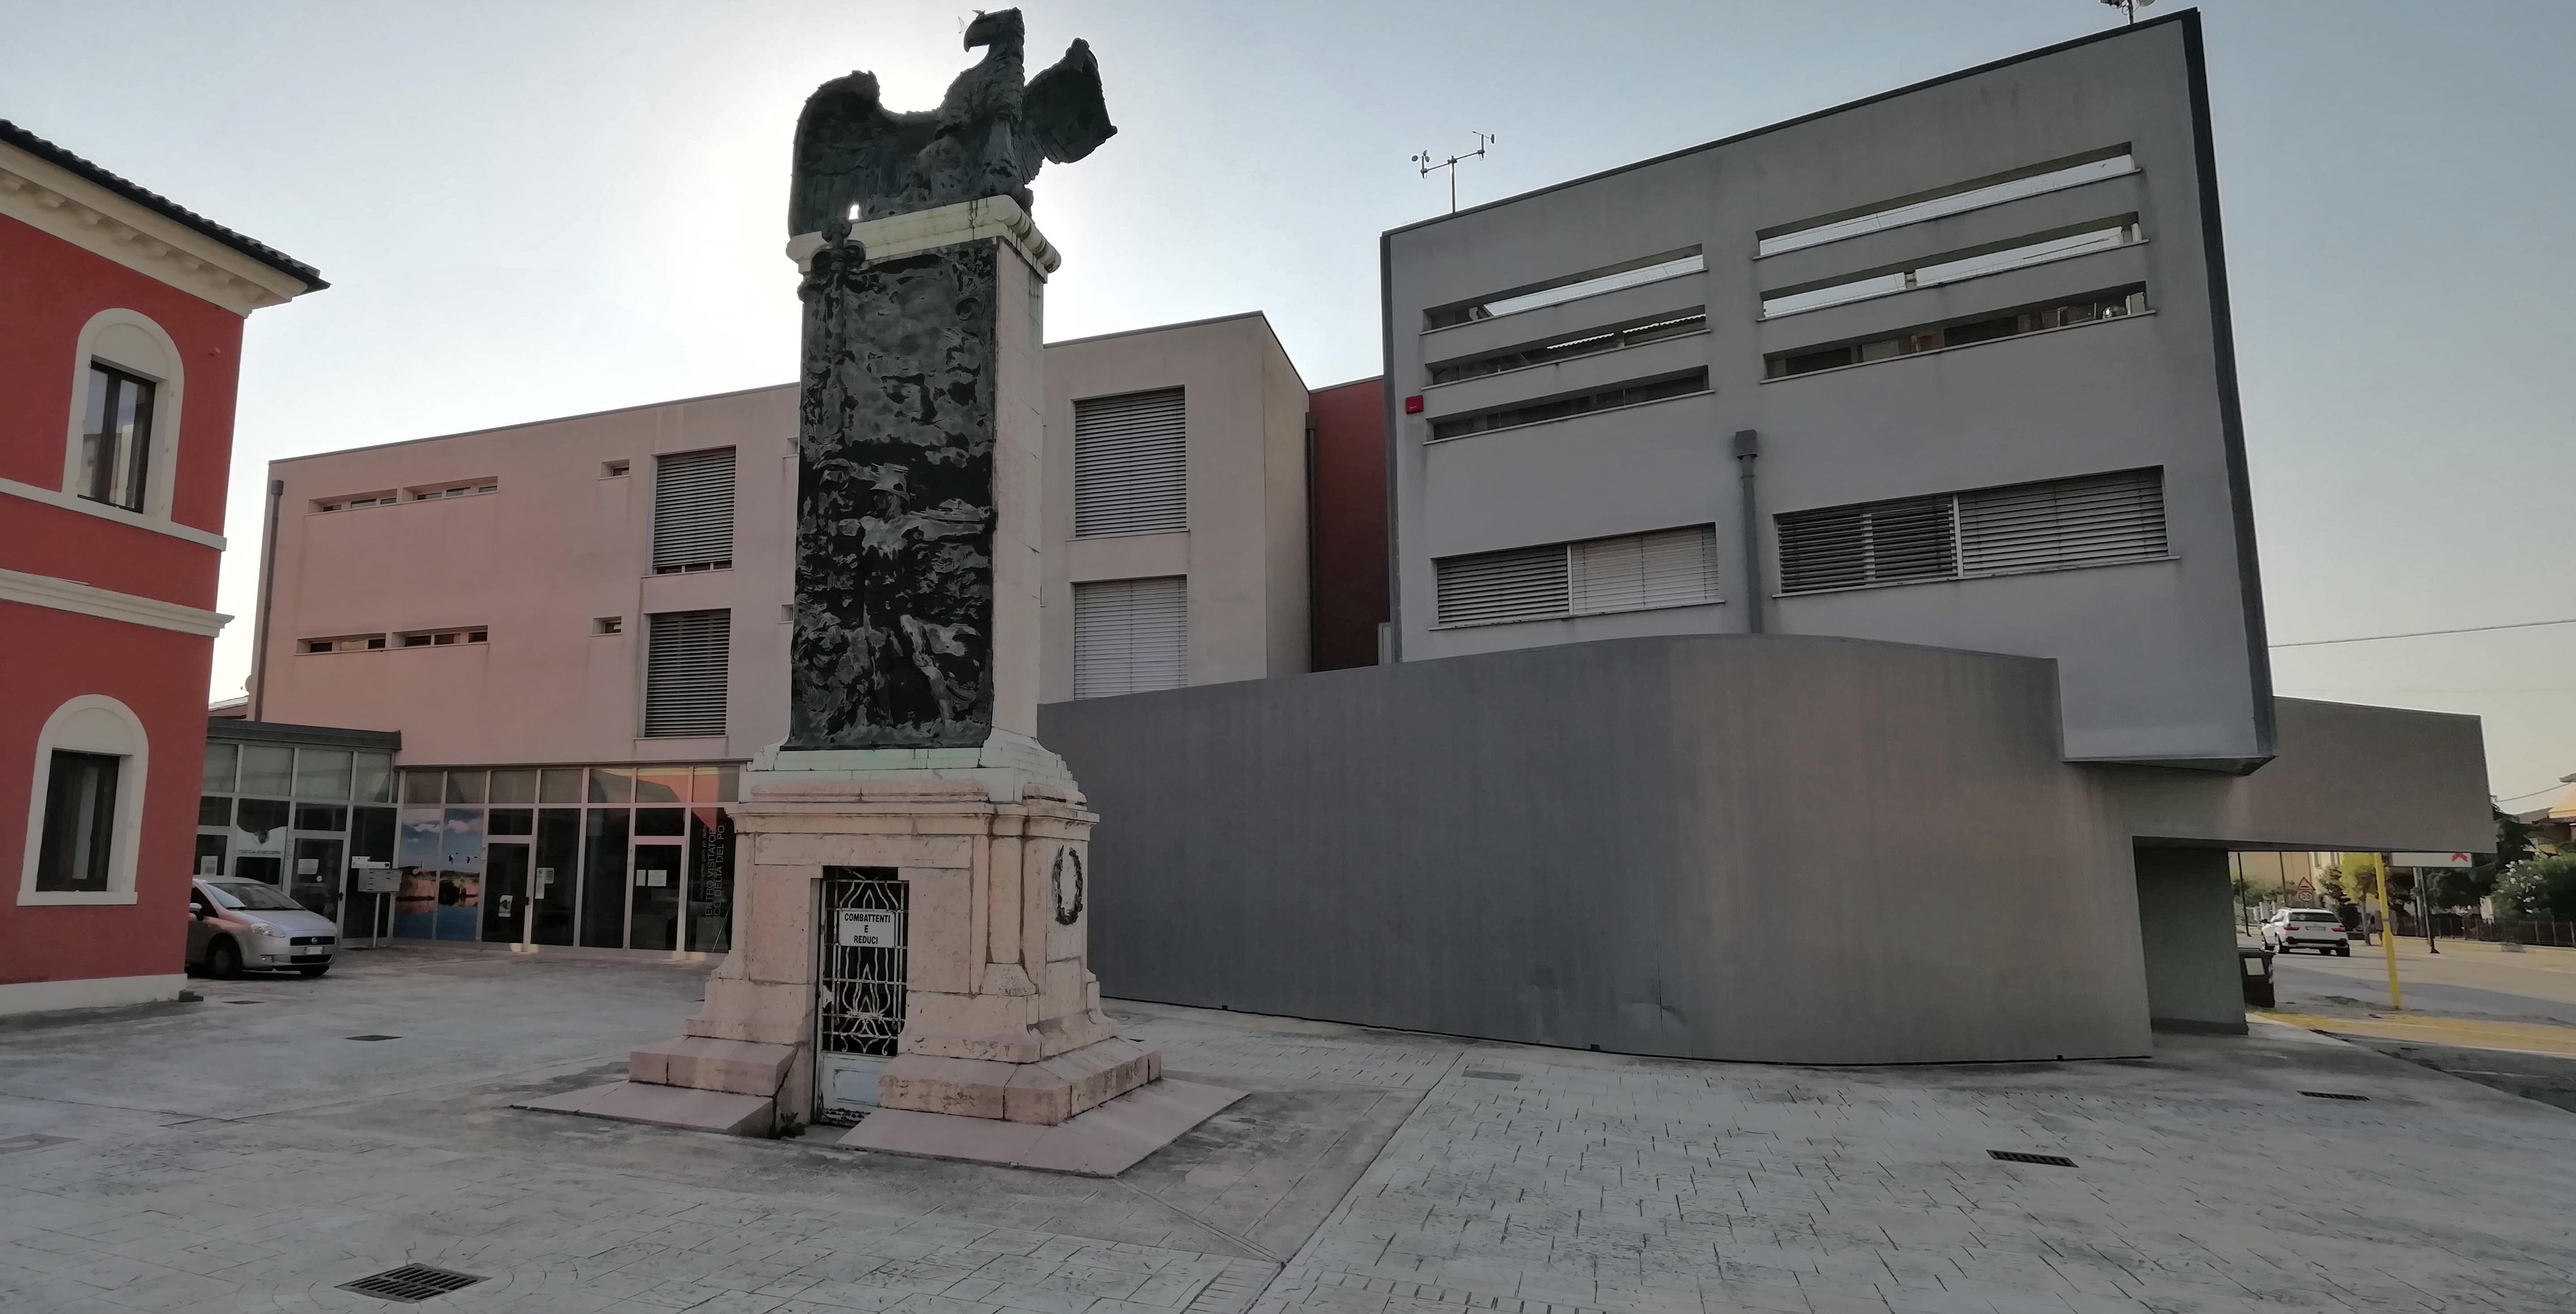 Visitor-center